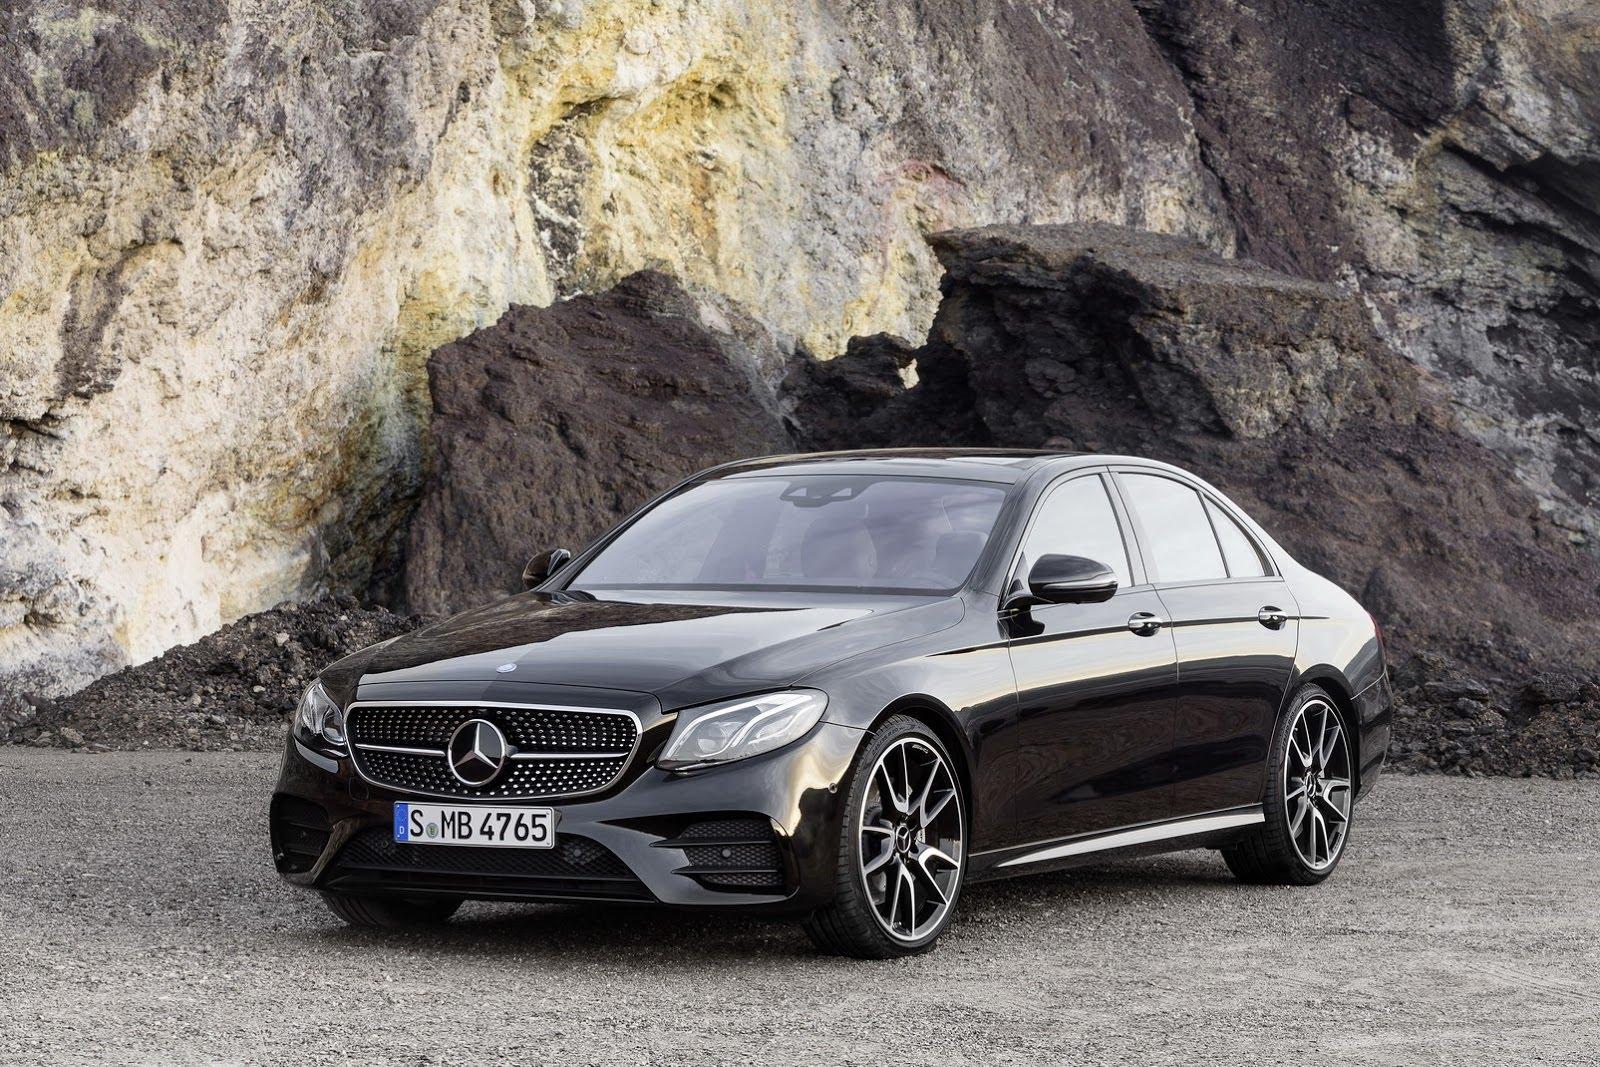 Velika nemačka trojka E segmenta – Mercedes-Benz E klase (II deo)